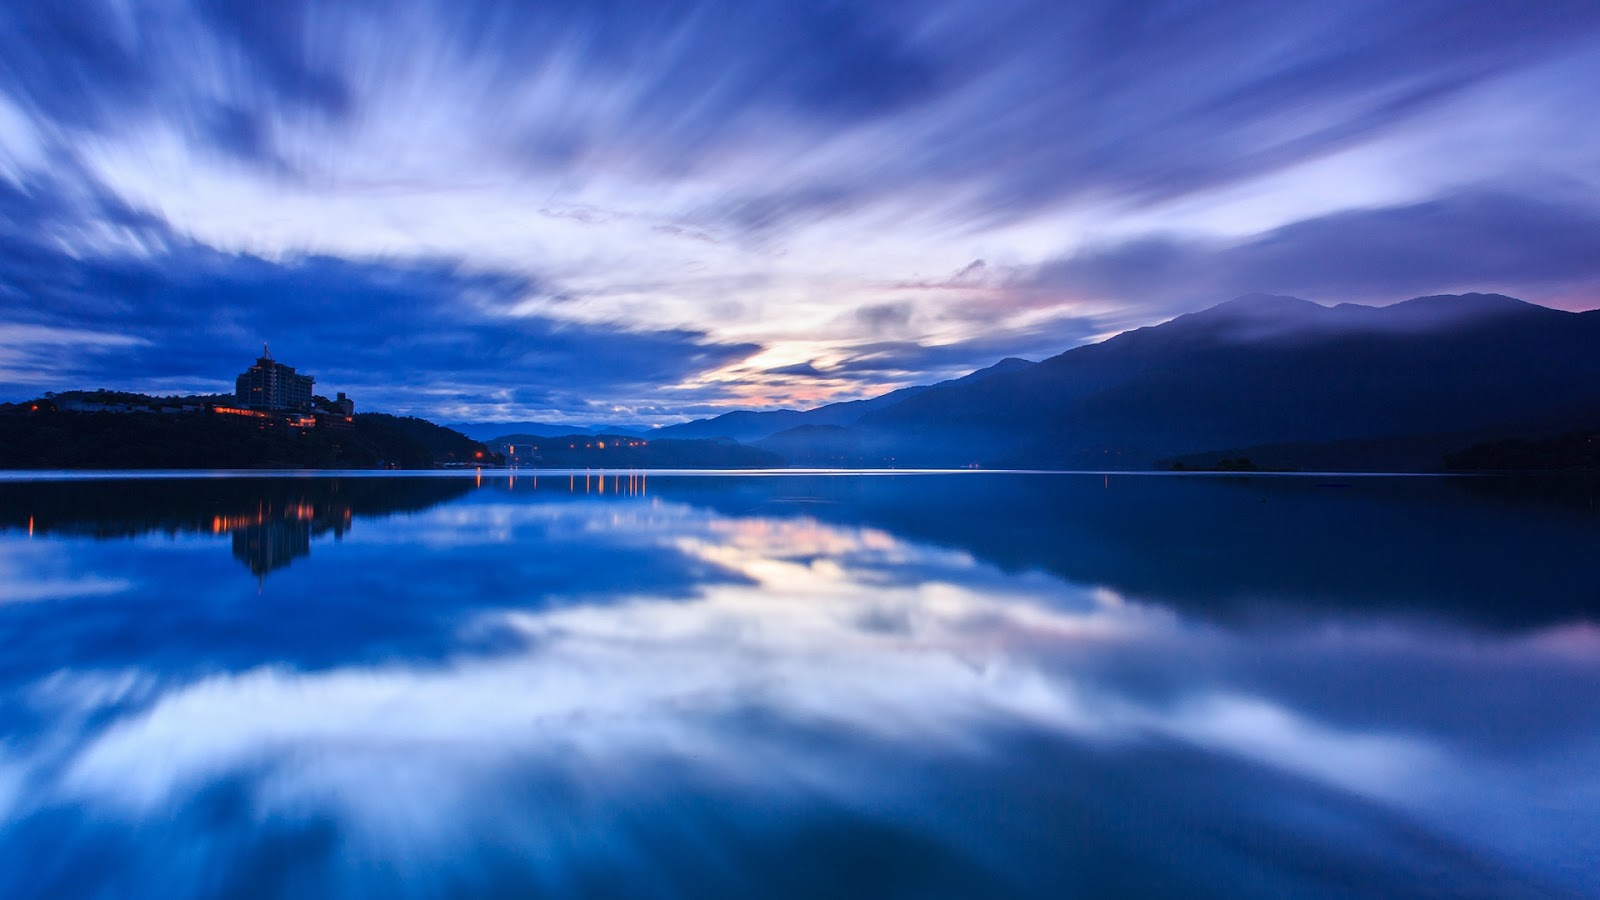 Taiwan Blue Sunset Lake